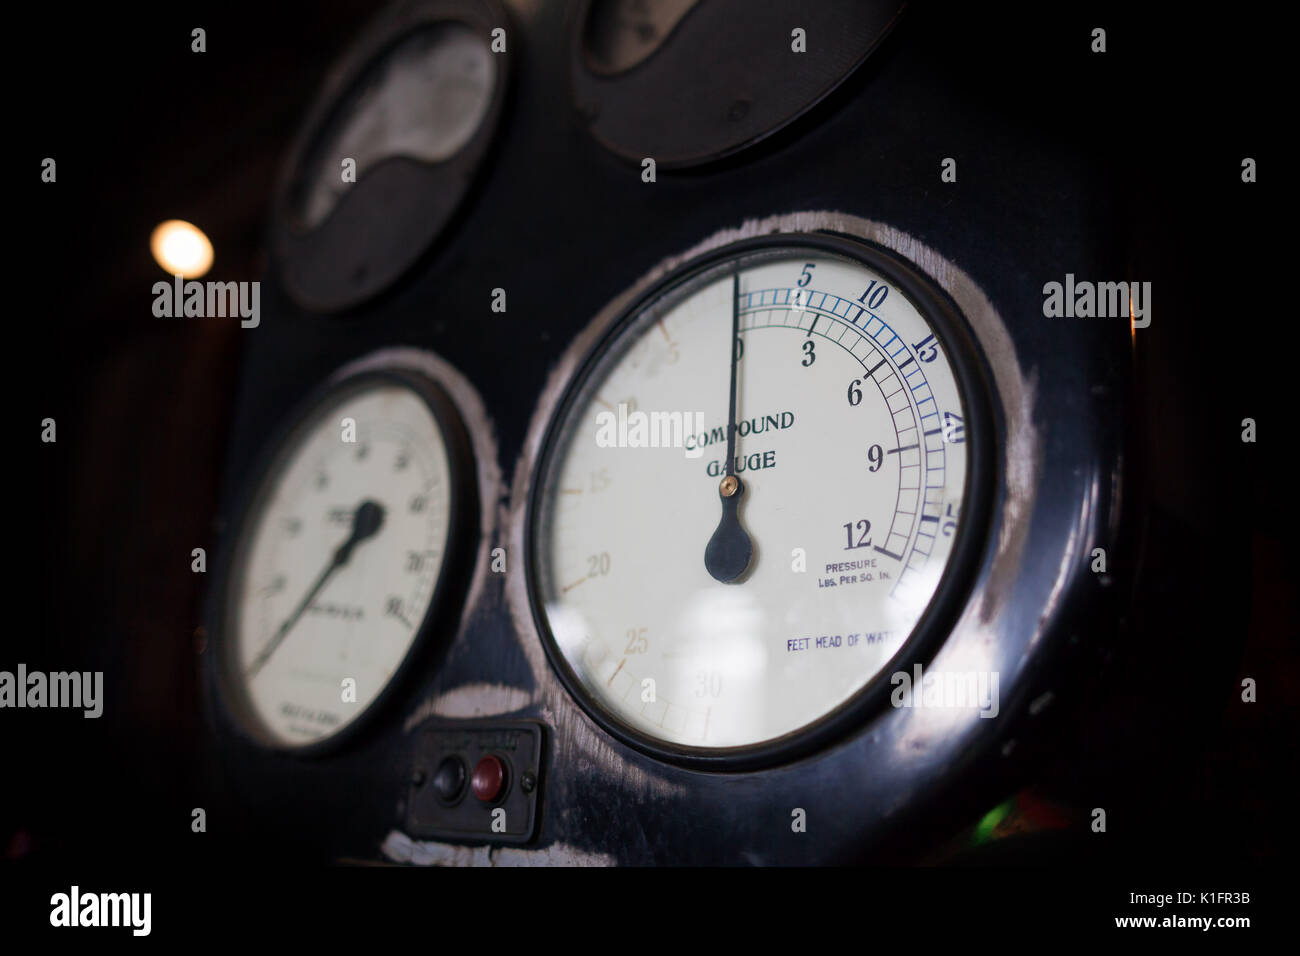 Vintage pressure gauges closeup - Stock Image